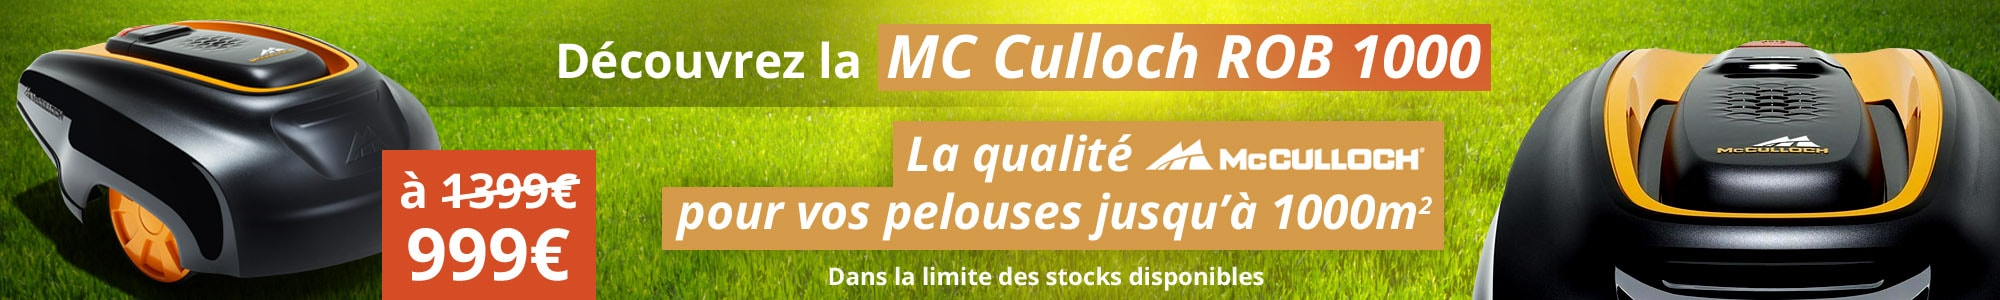 Découvrez la MC Culloch ROB 1000